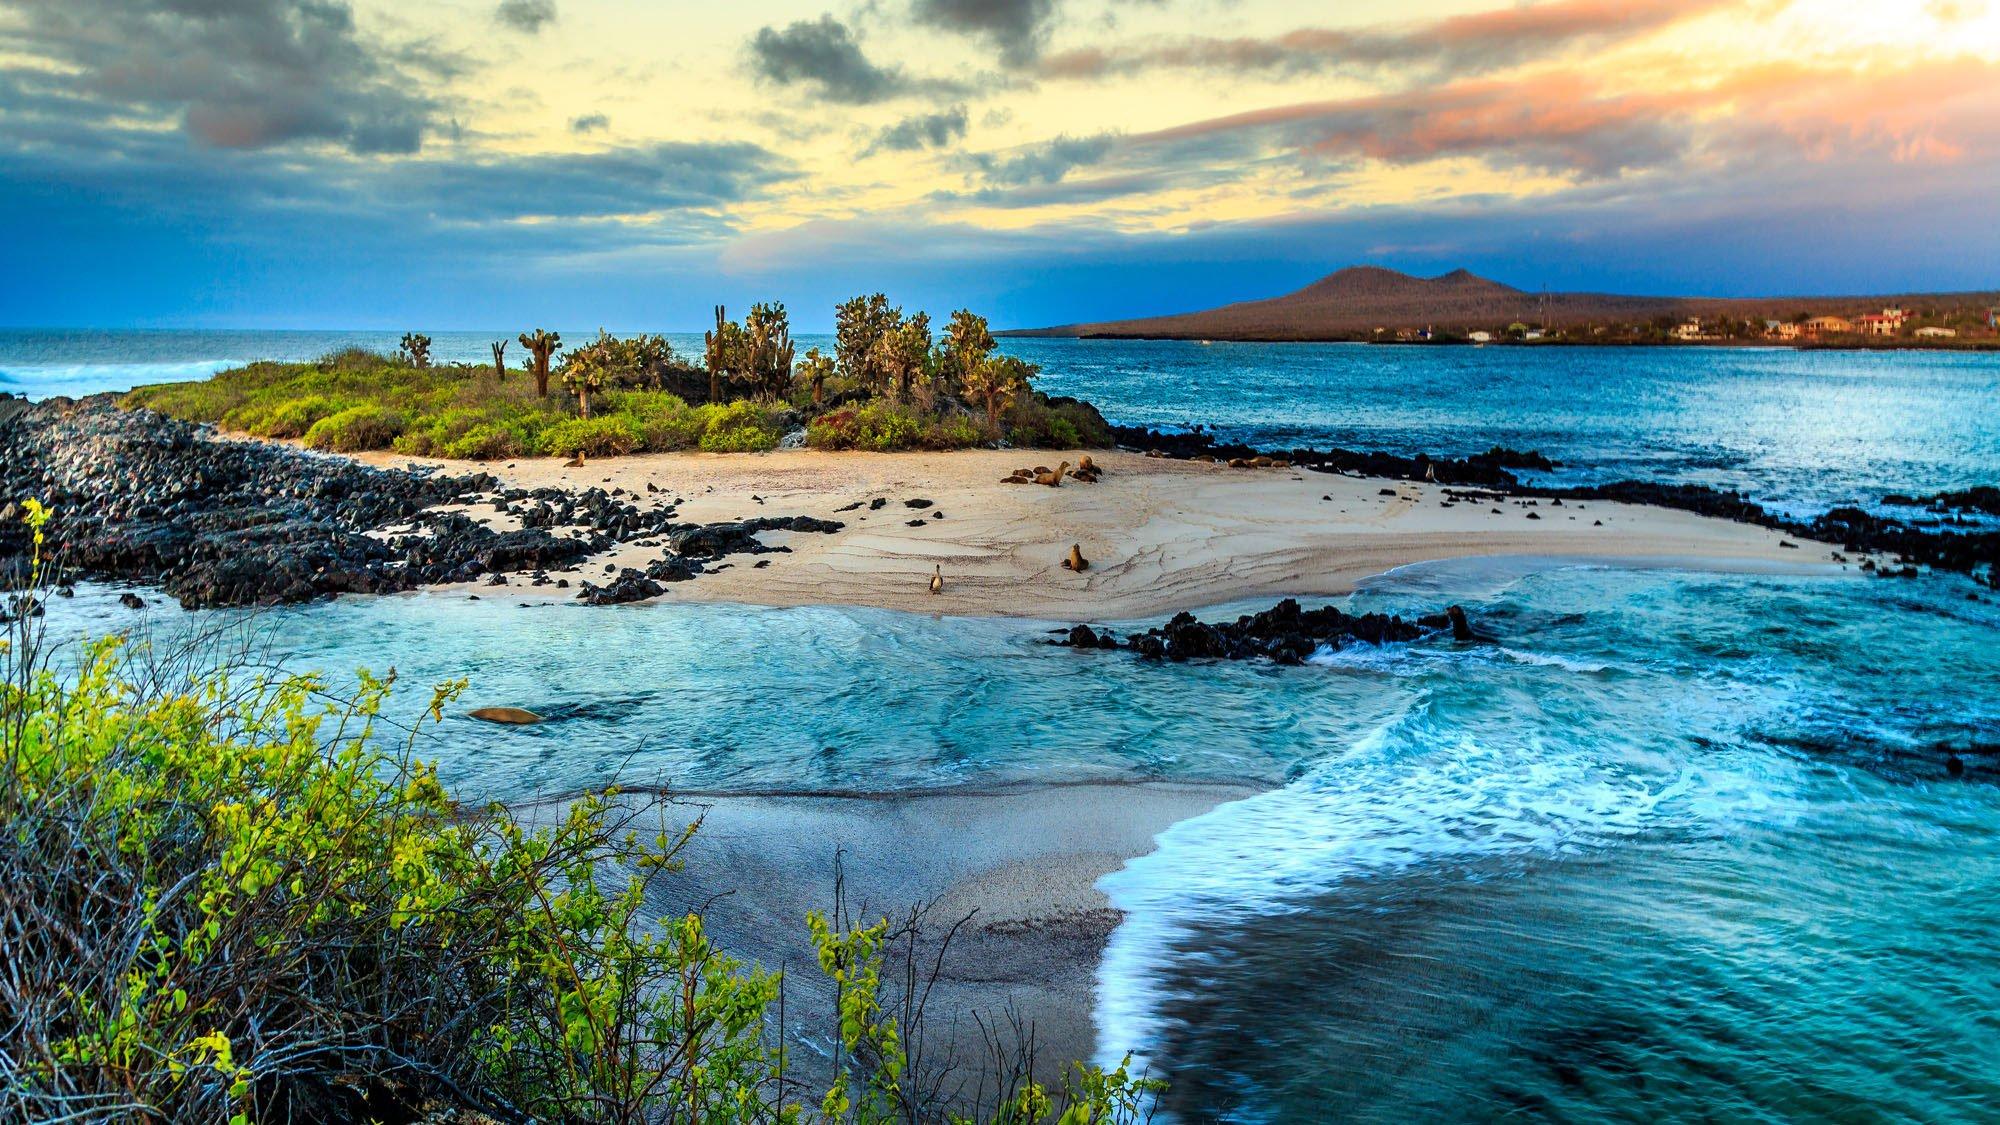 galapagos-islands-8.jpg